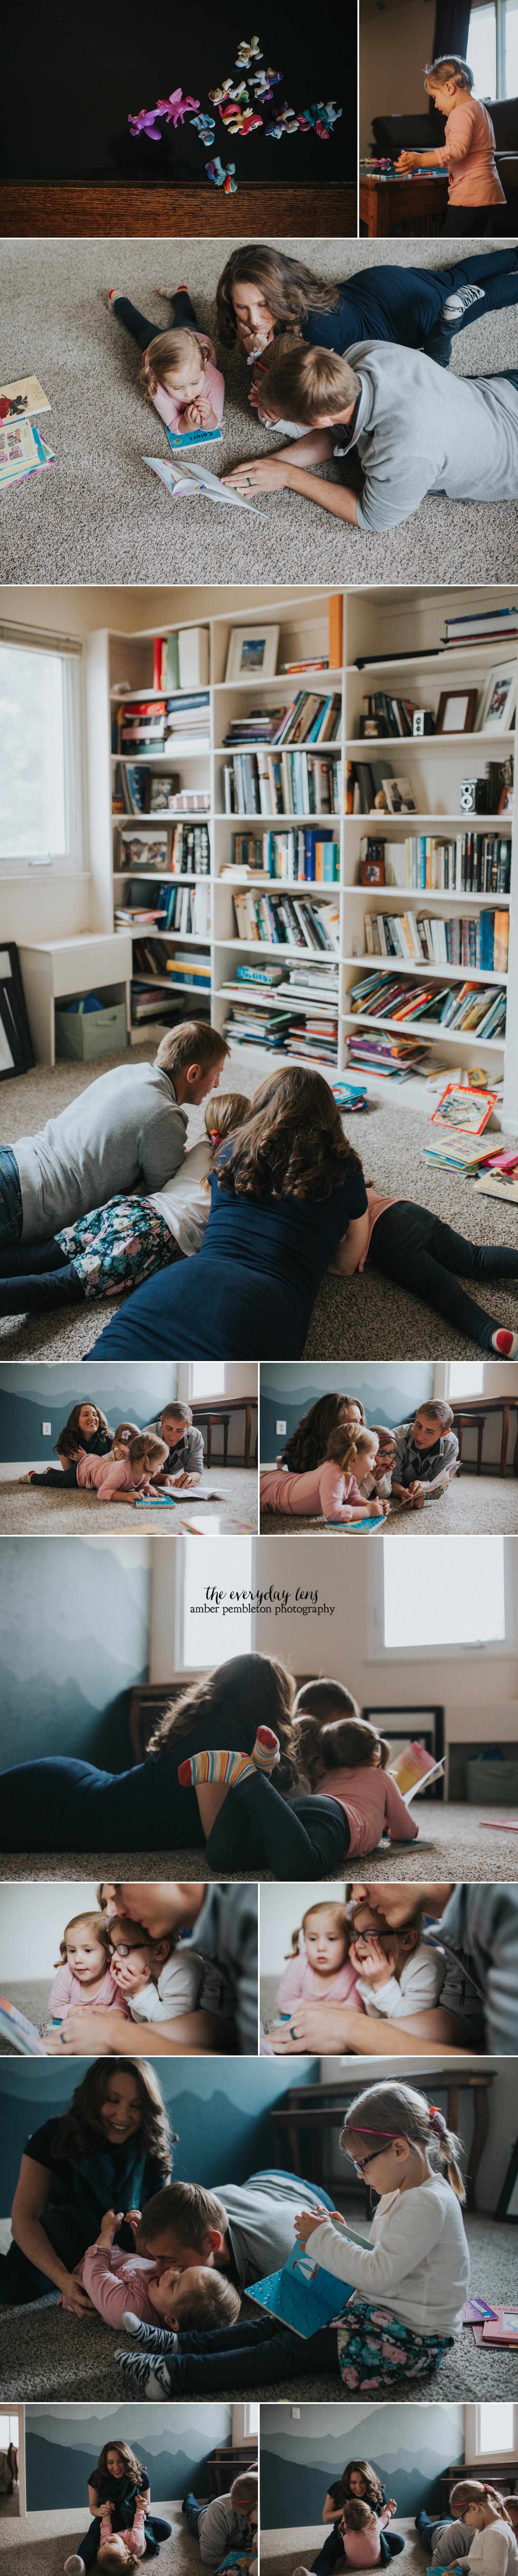 parents-reading-books-to-children.jpg